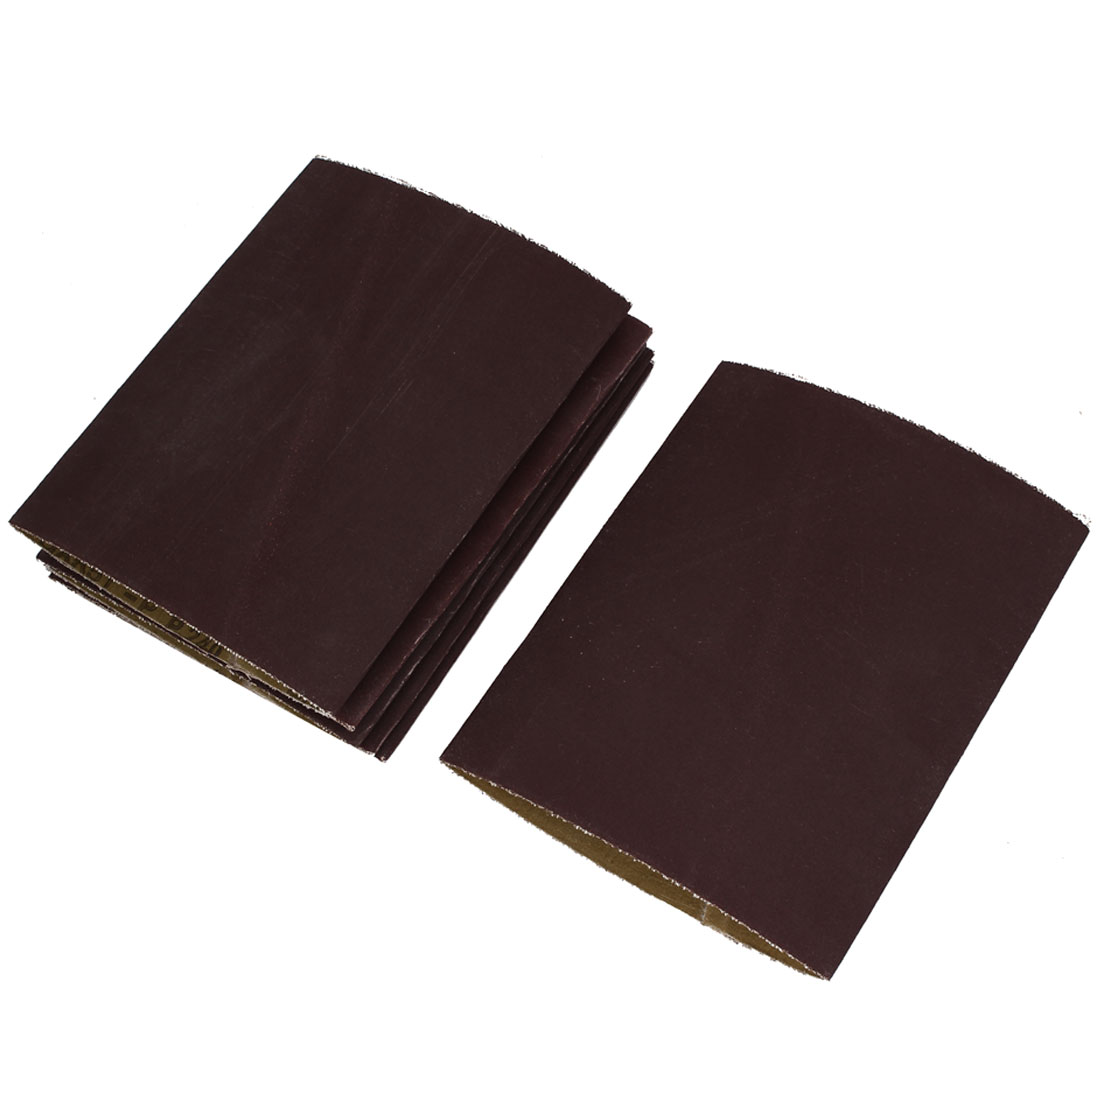 Woodworking 340mmx210mm 240 Grit Abrasive Sanding Belt Sandpaper 6pcs